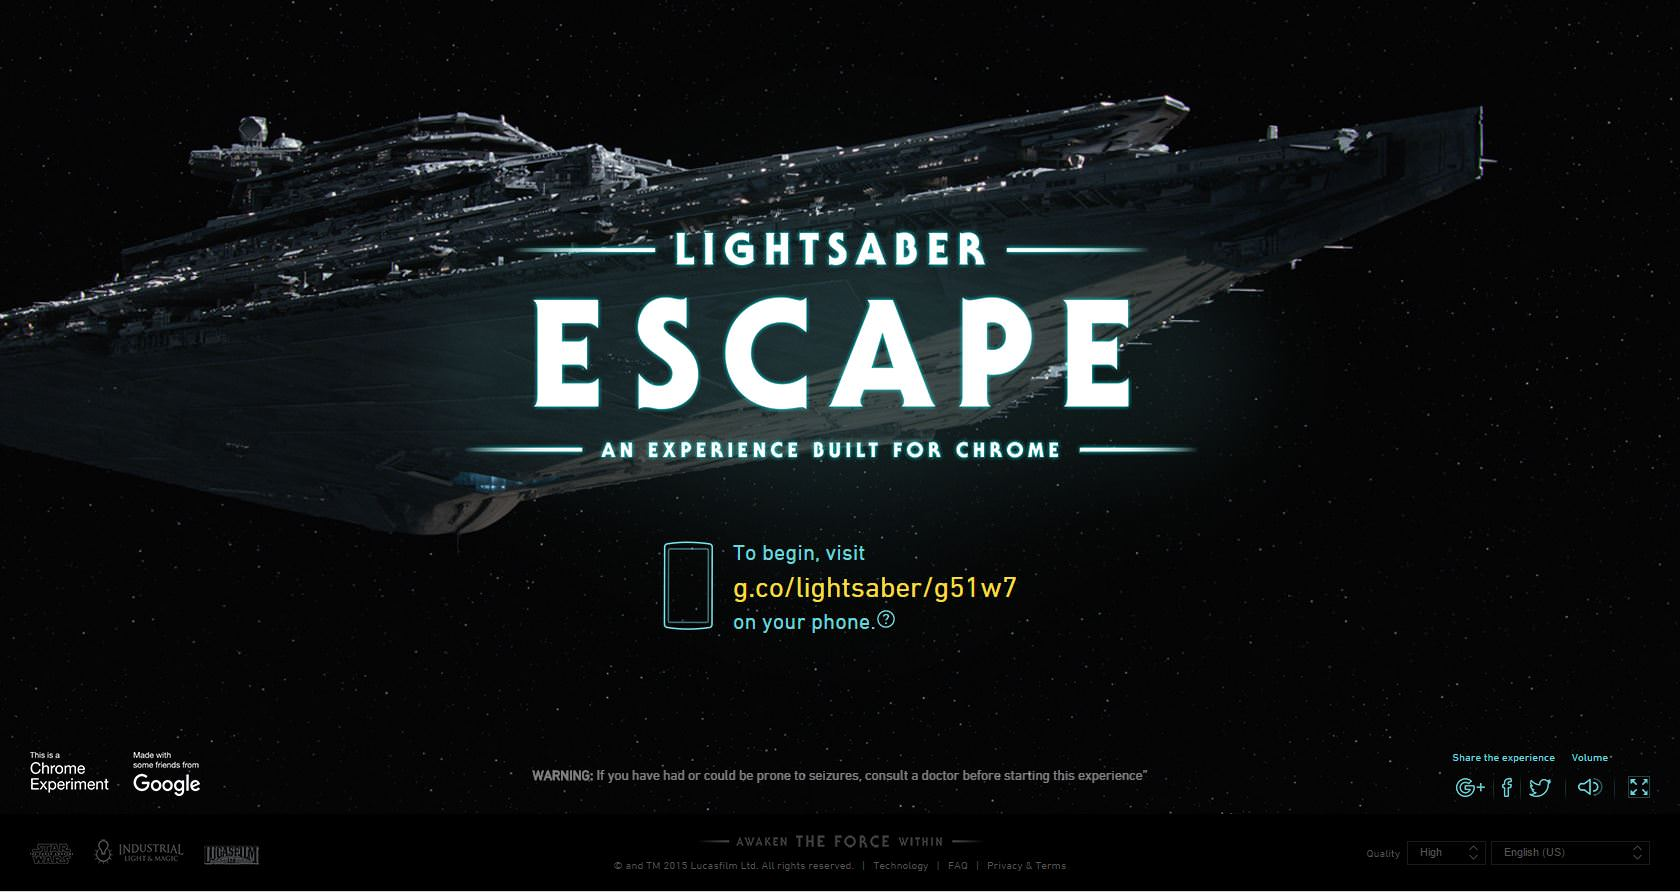 Jocul Lightsaber Escape de la Google